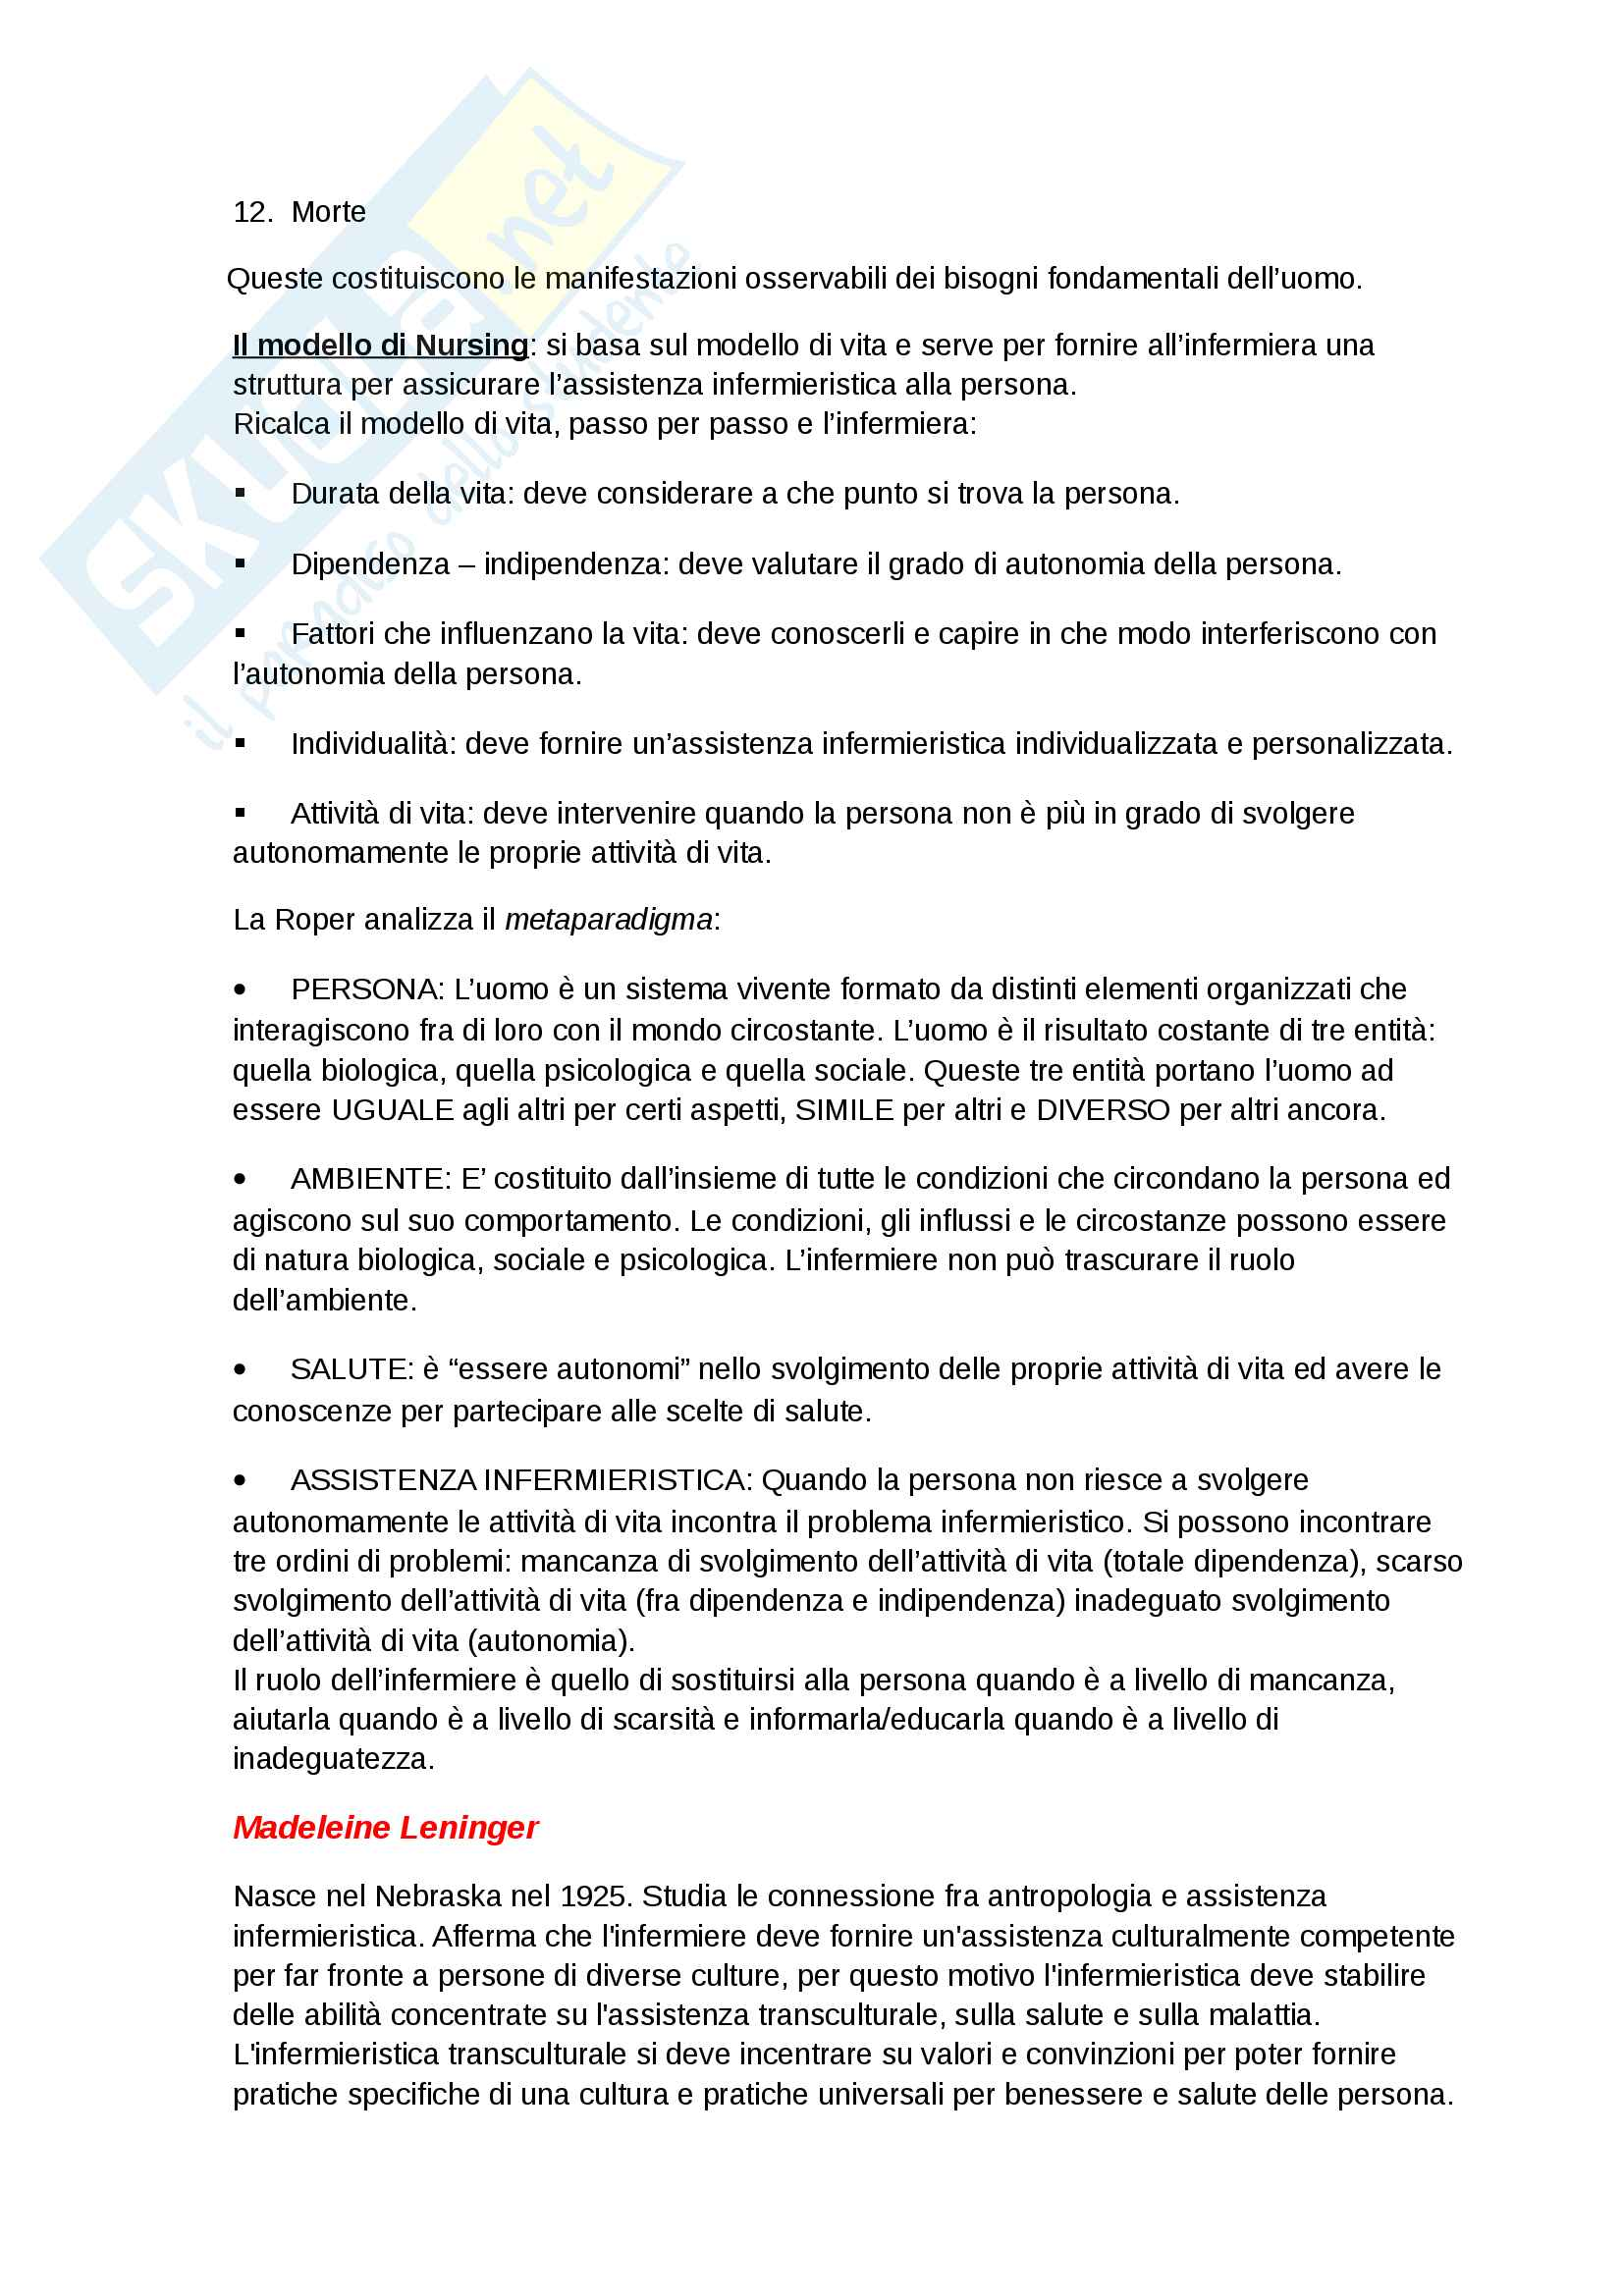 Teorie del nursing-Appunti Completi Pag. 16